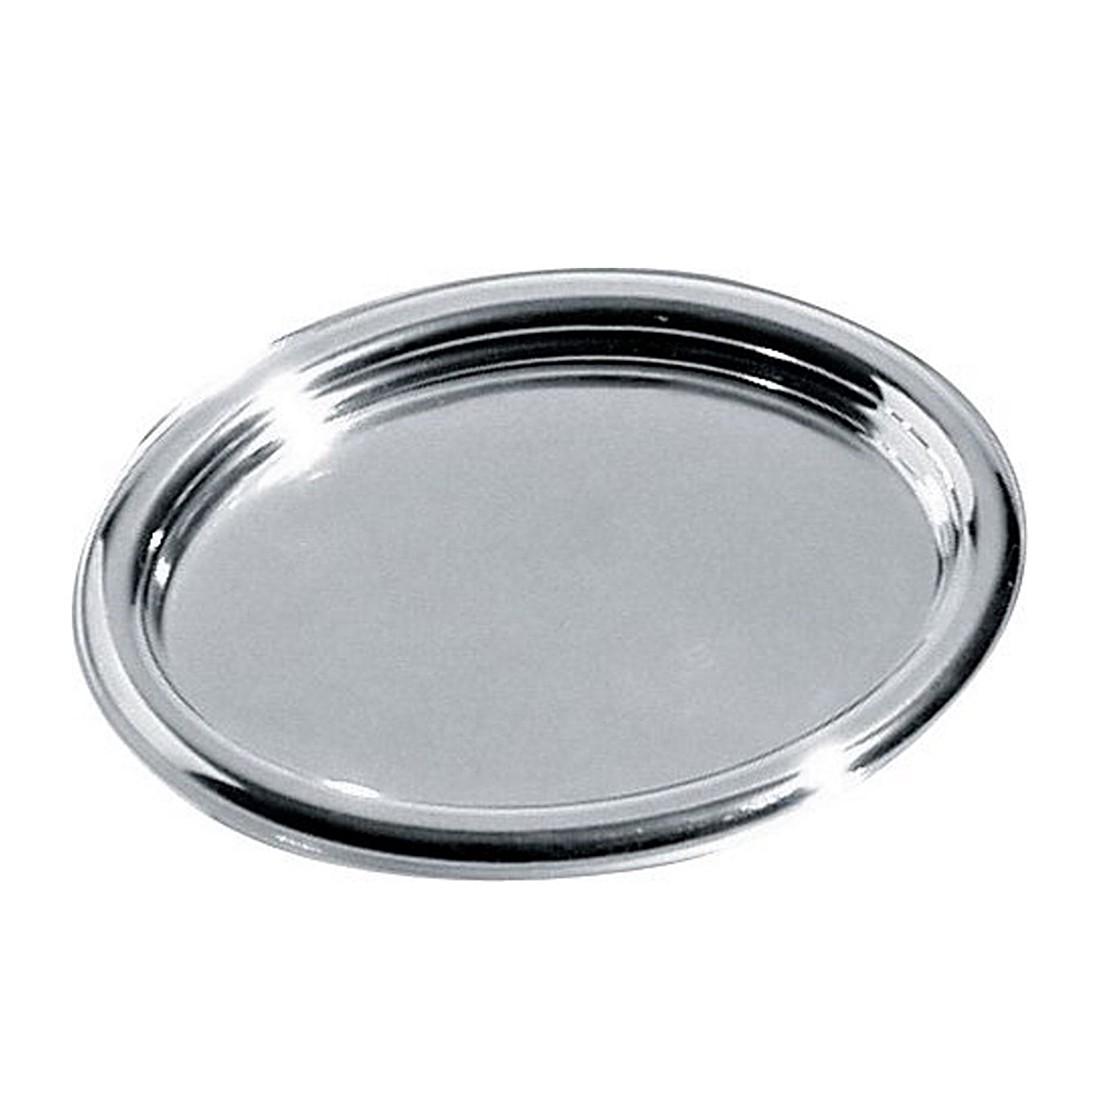 Platte Vassoio Ovale – oval/46 x 40 cm, Alessi jetzt bestellen